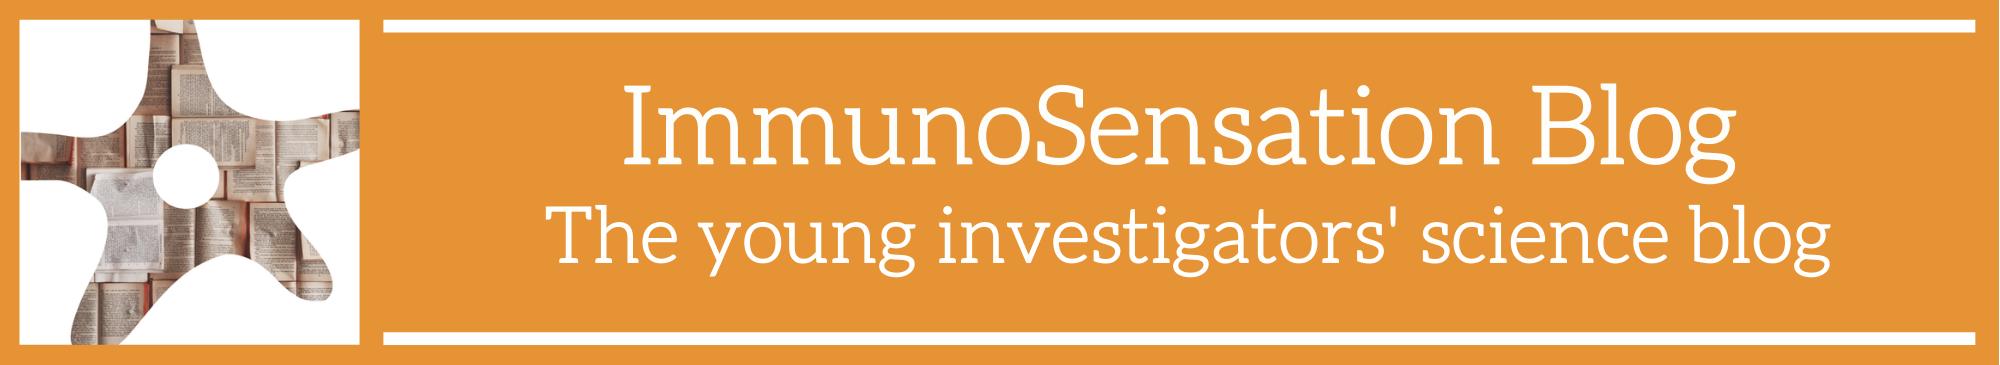 ImmunosensationBlog